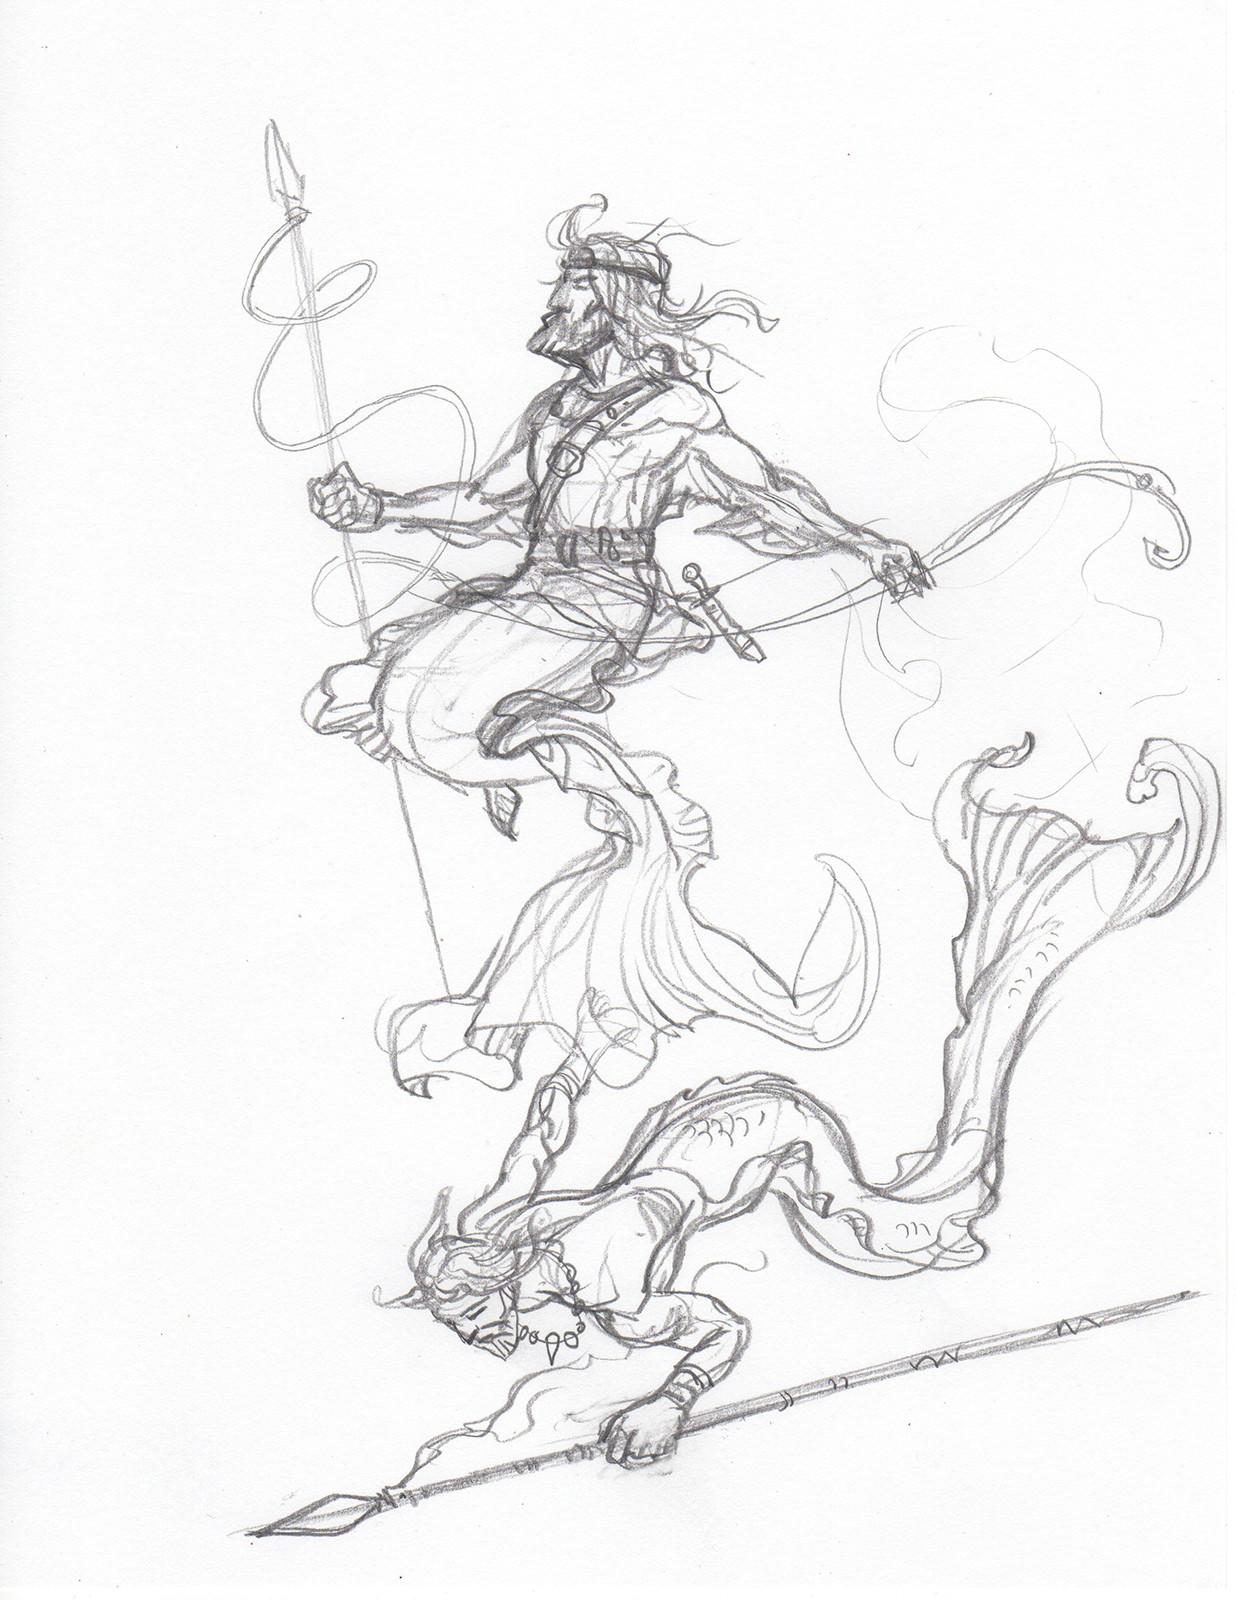 Finman sketch